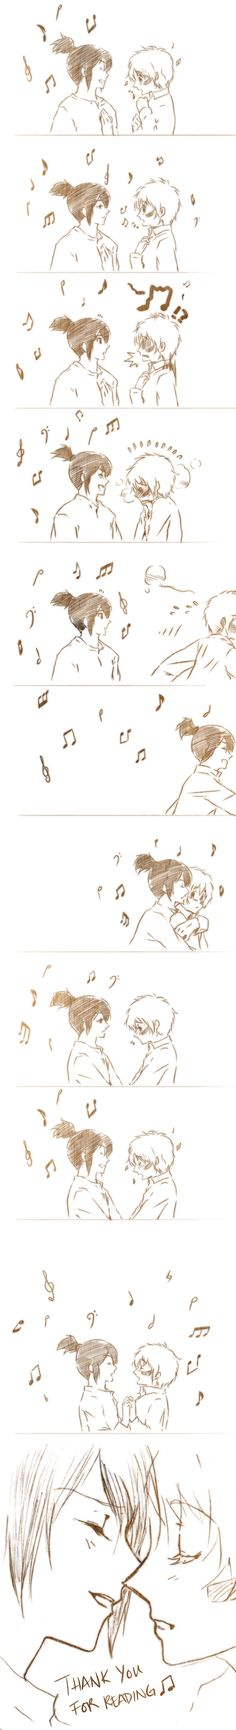 No. 6: Let's Sing A Song by piggyhoho on DeviantArt